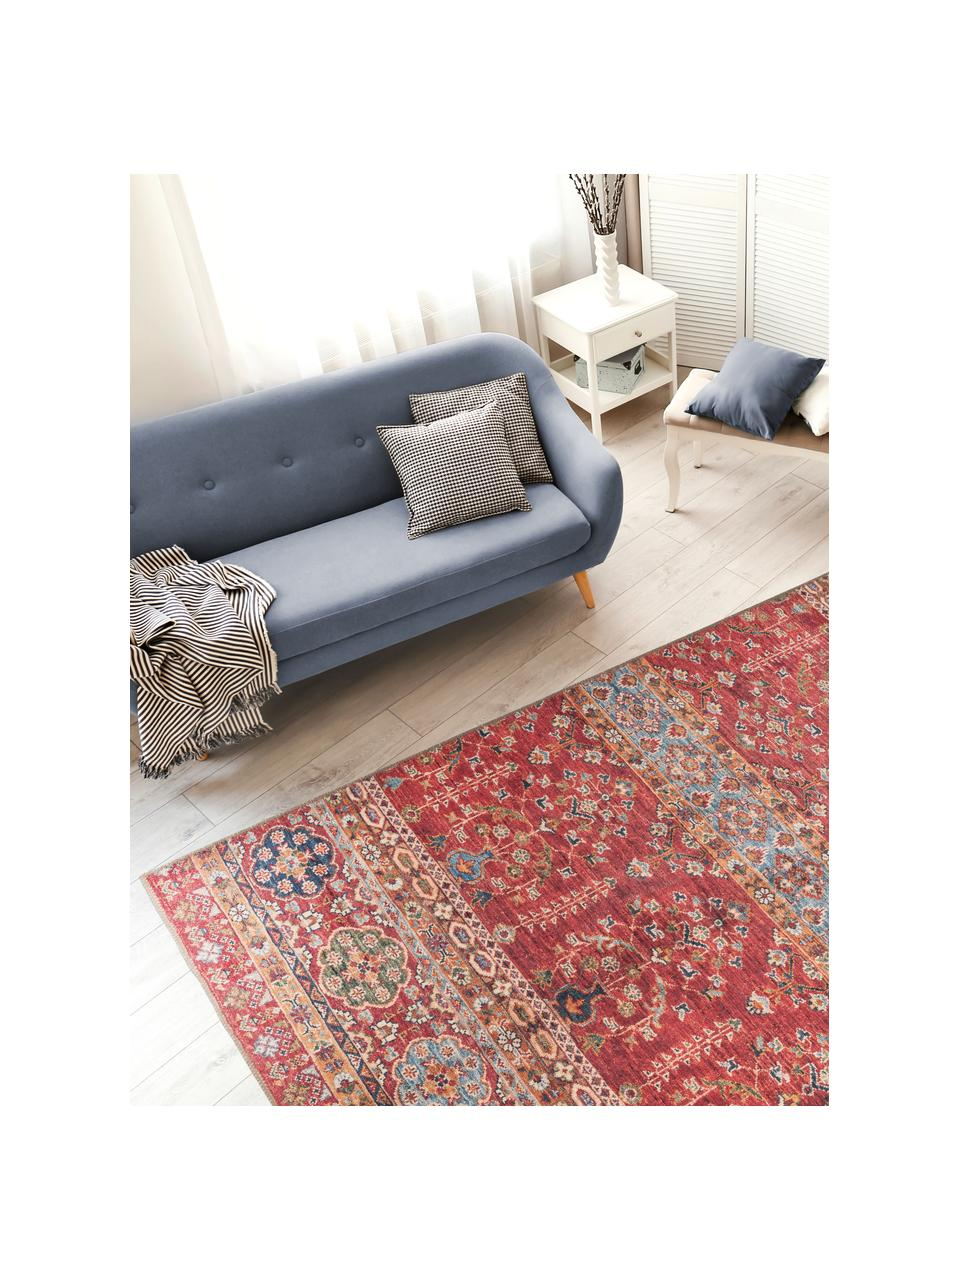 Niederflor-Teppich Femal im Orient Style, Flor: 100% Polyester, Rot, Mehrfarbig, B 75 x L 150 cm (Größe XS)